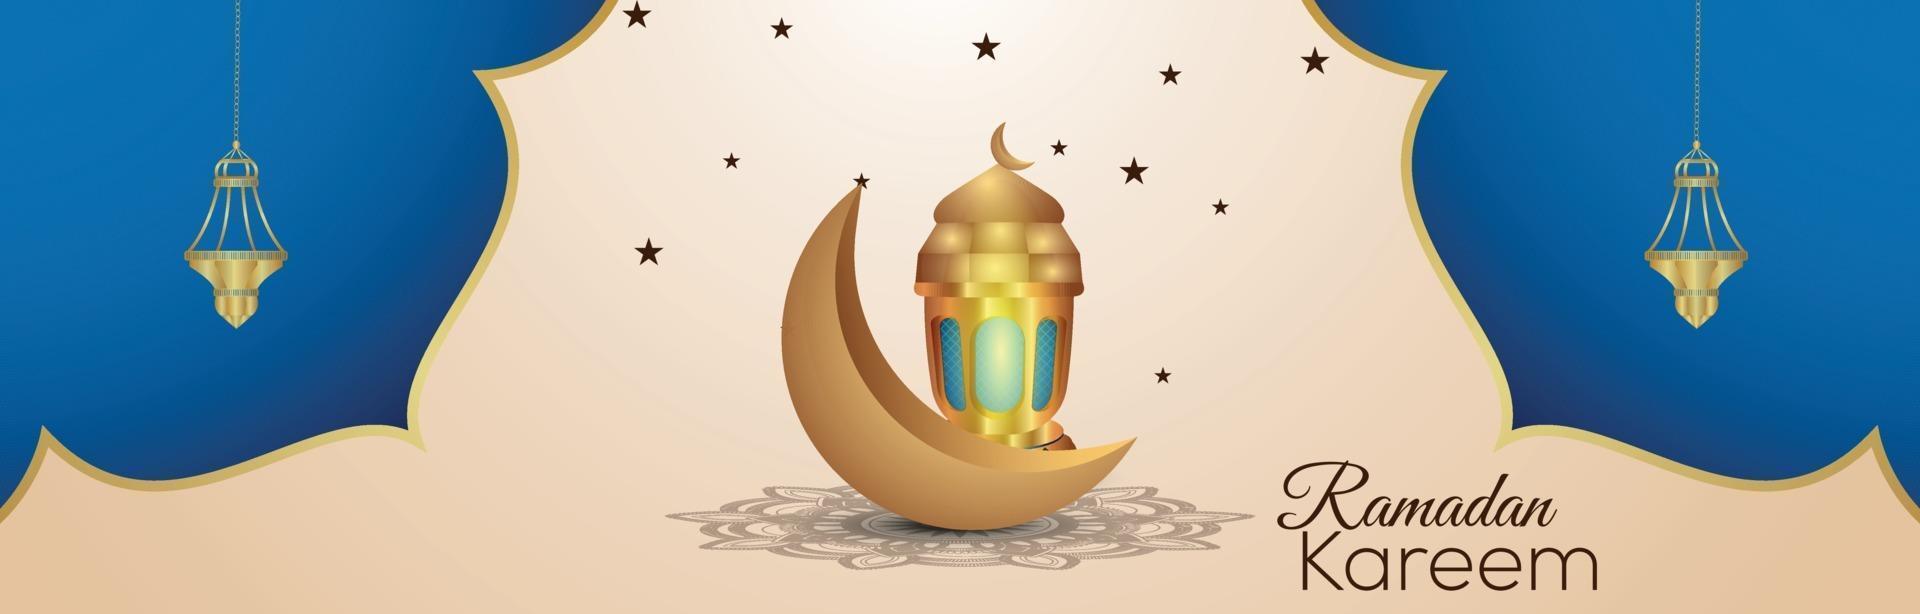 ramadan kareem islamisk festivalinbjudanbakgrund vektor